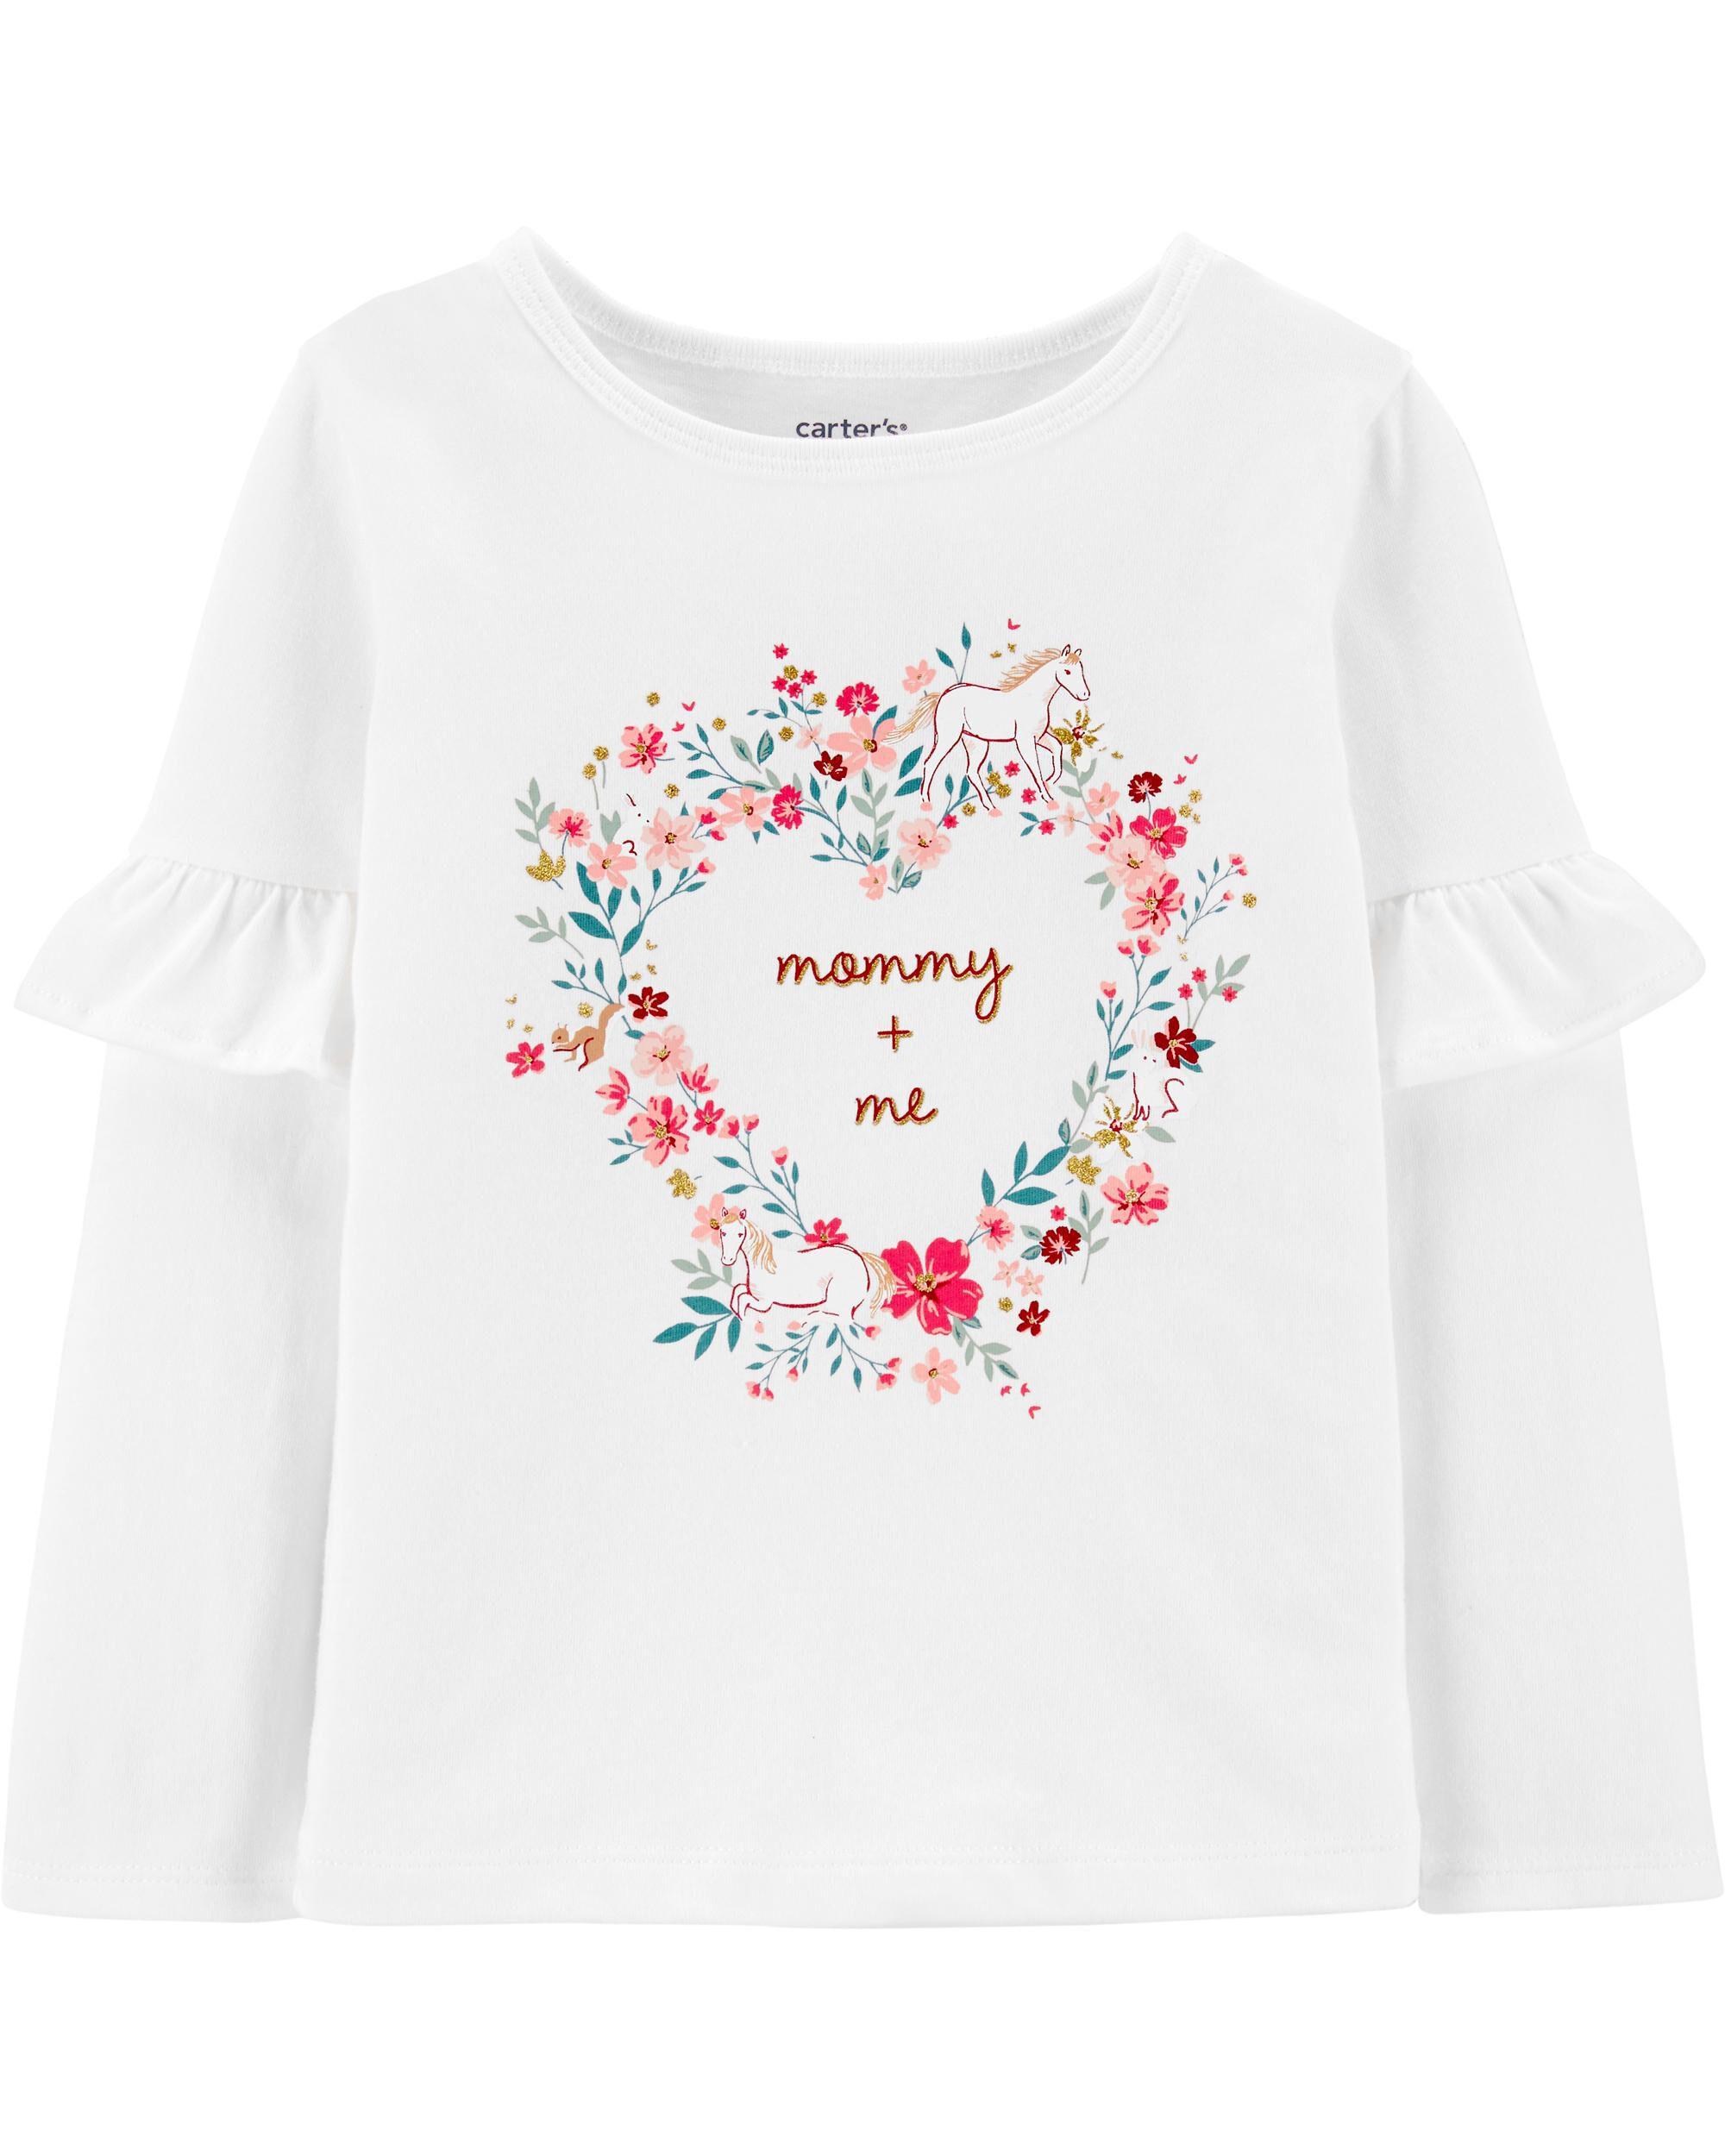 Carters Baby Girls Heart Jersey Tee